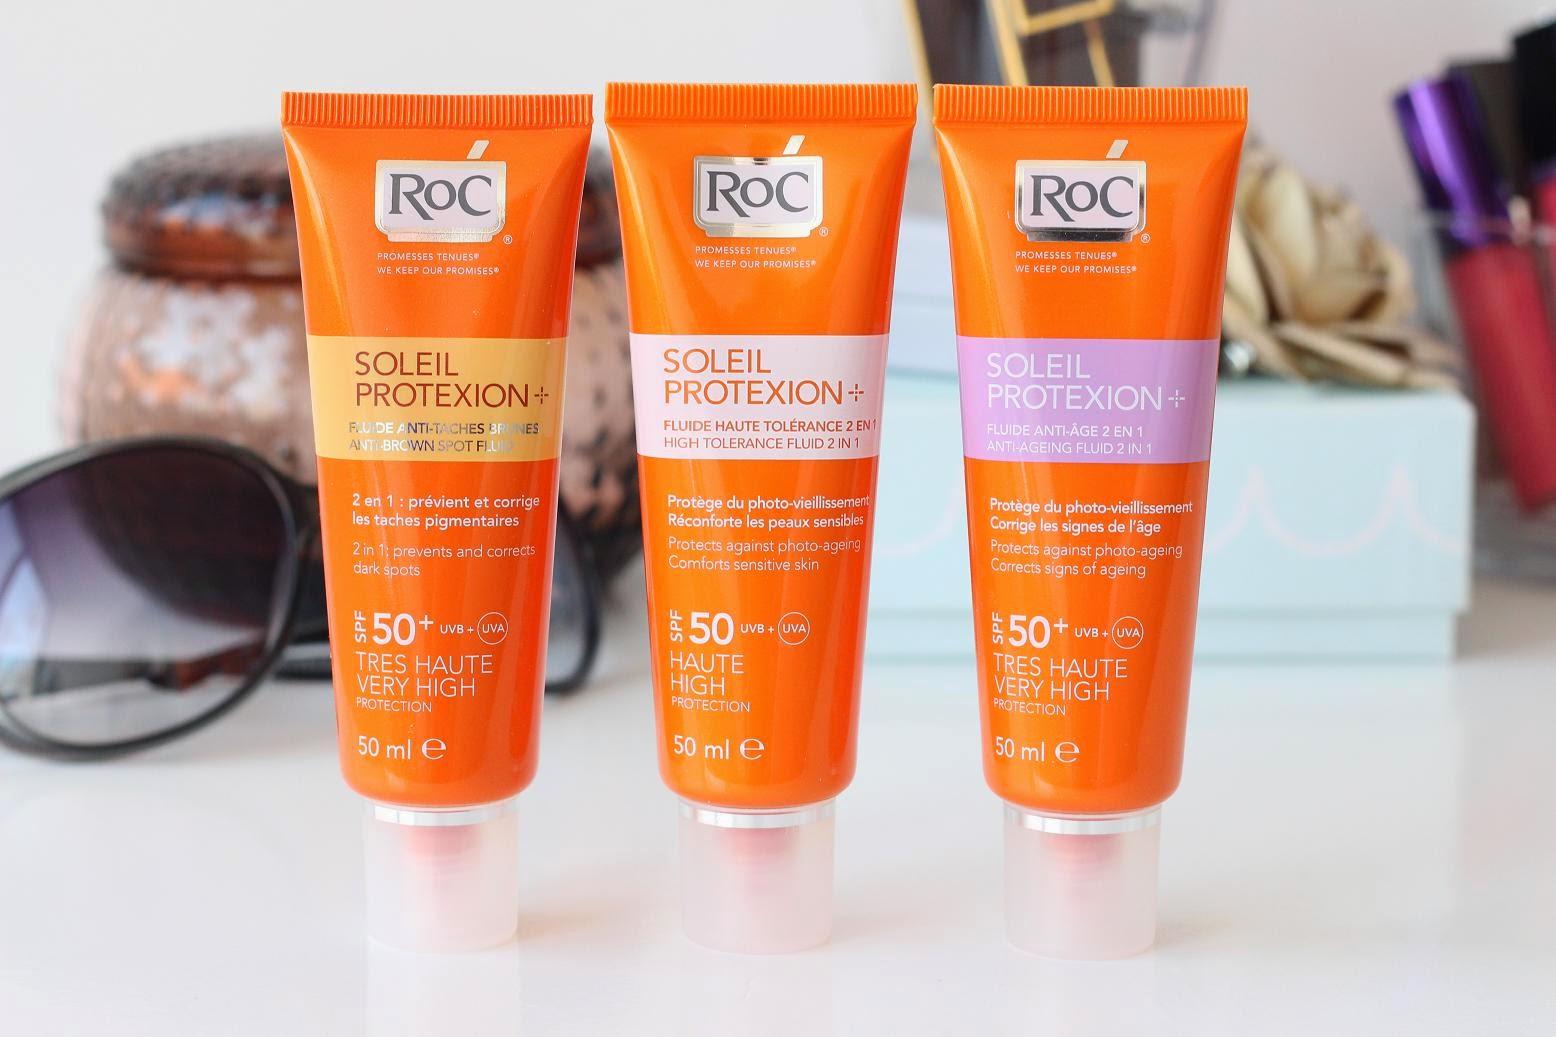 RoC Soleil Protexion +